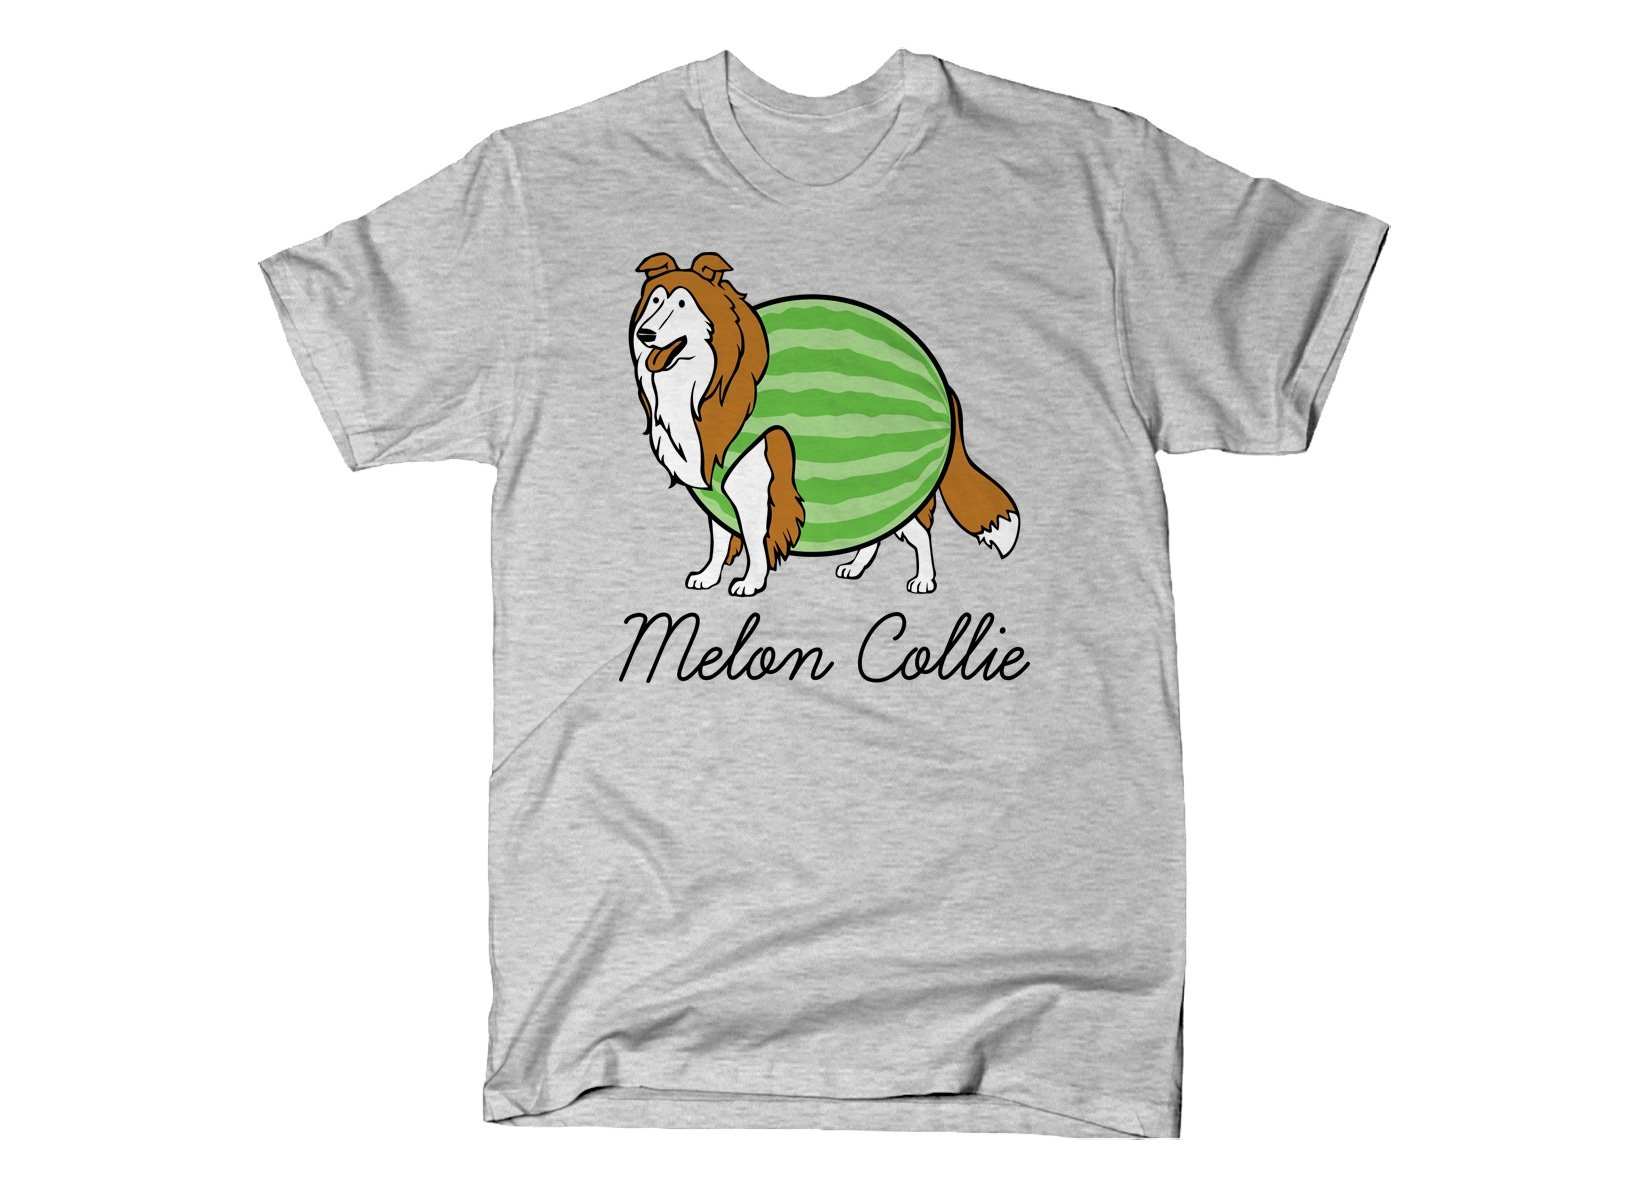 Melon Collie on Mens T-Shirt